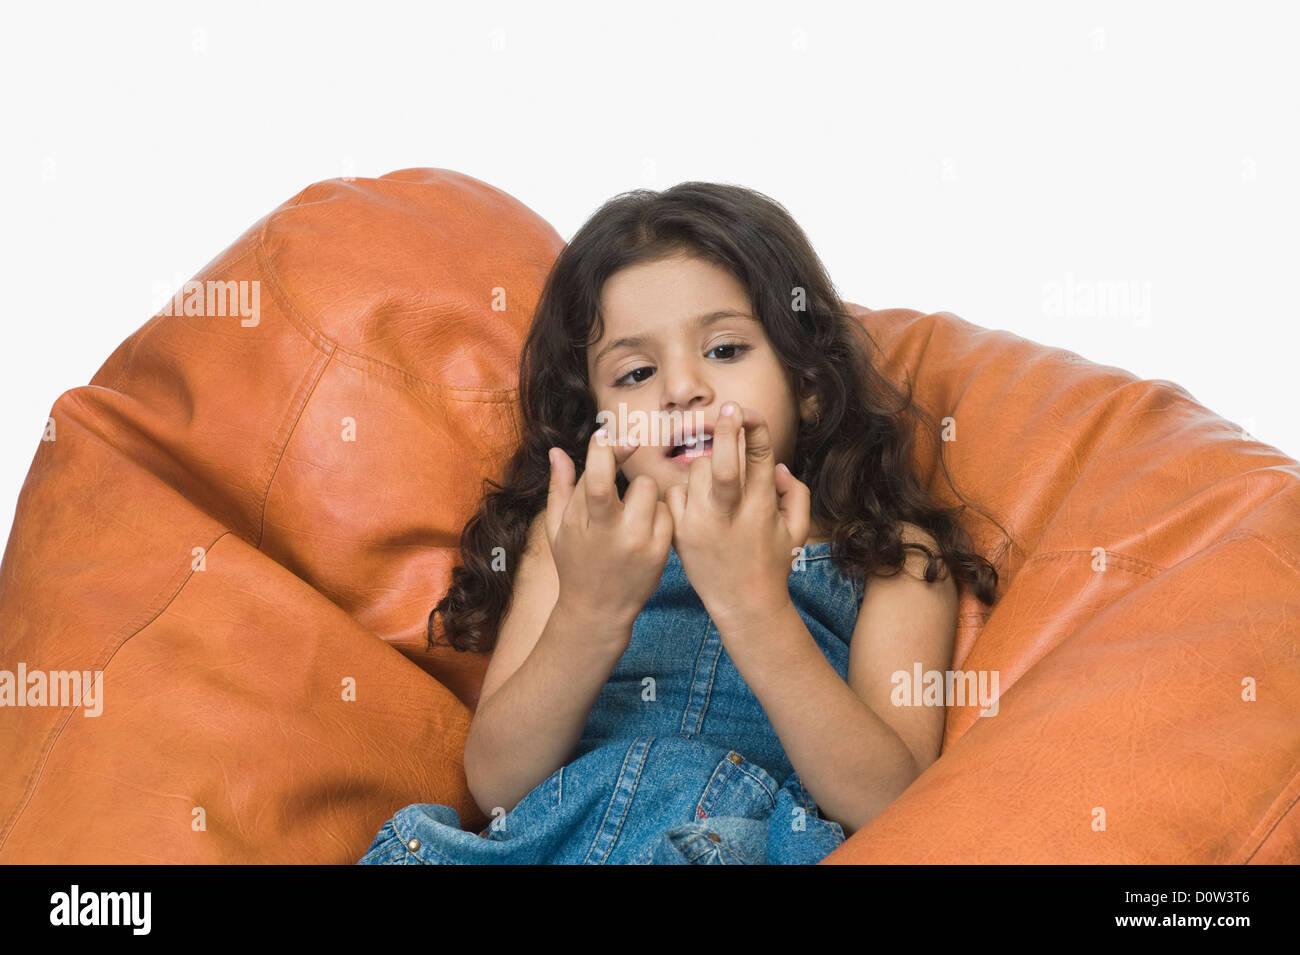 Girl playing on a bean bag - Stock Image